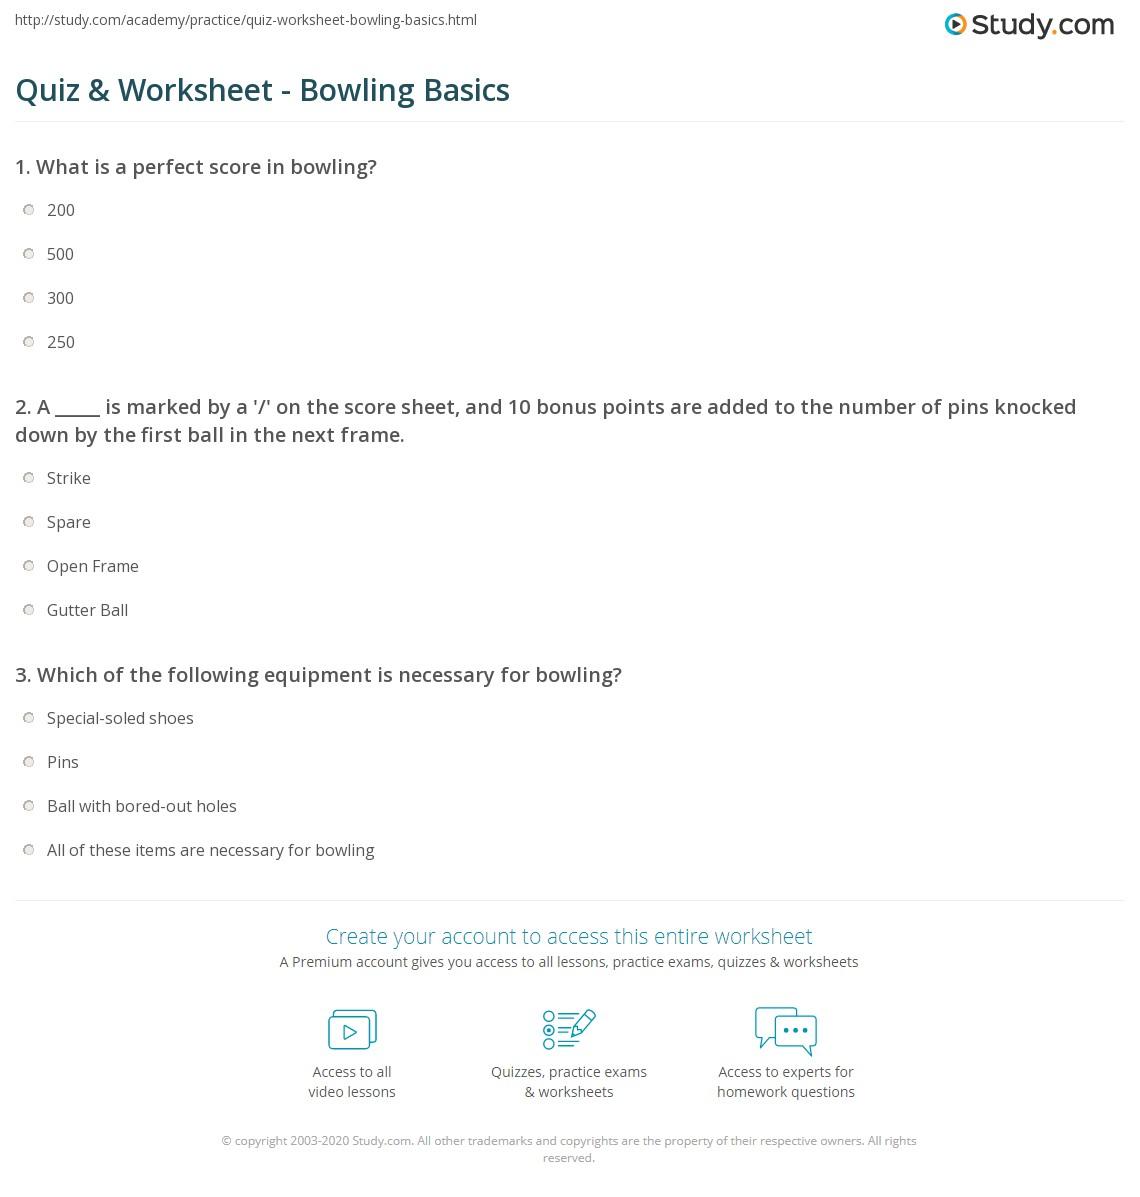 Quiz & Worksheet - Bowling Basics | Study.com